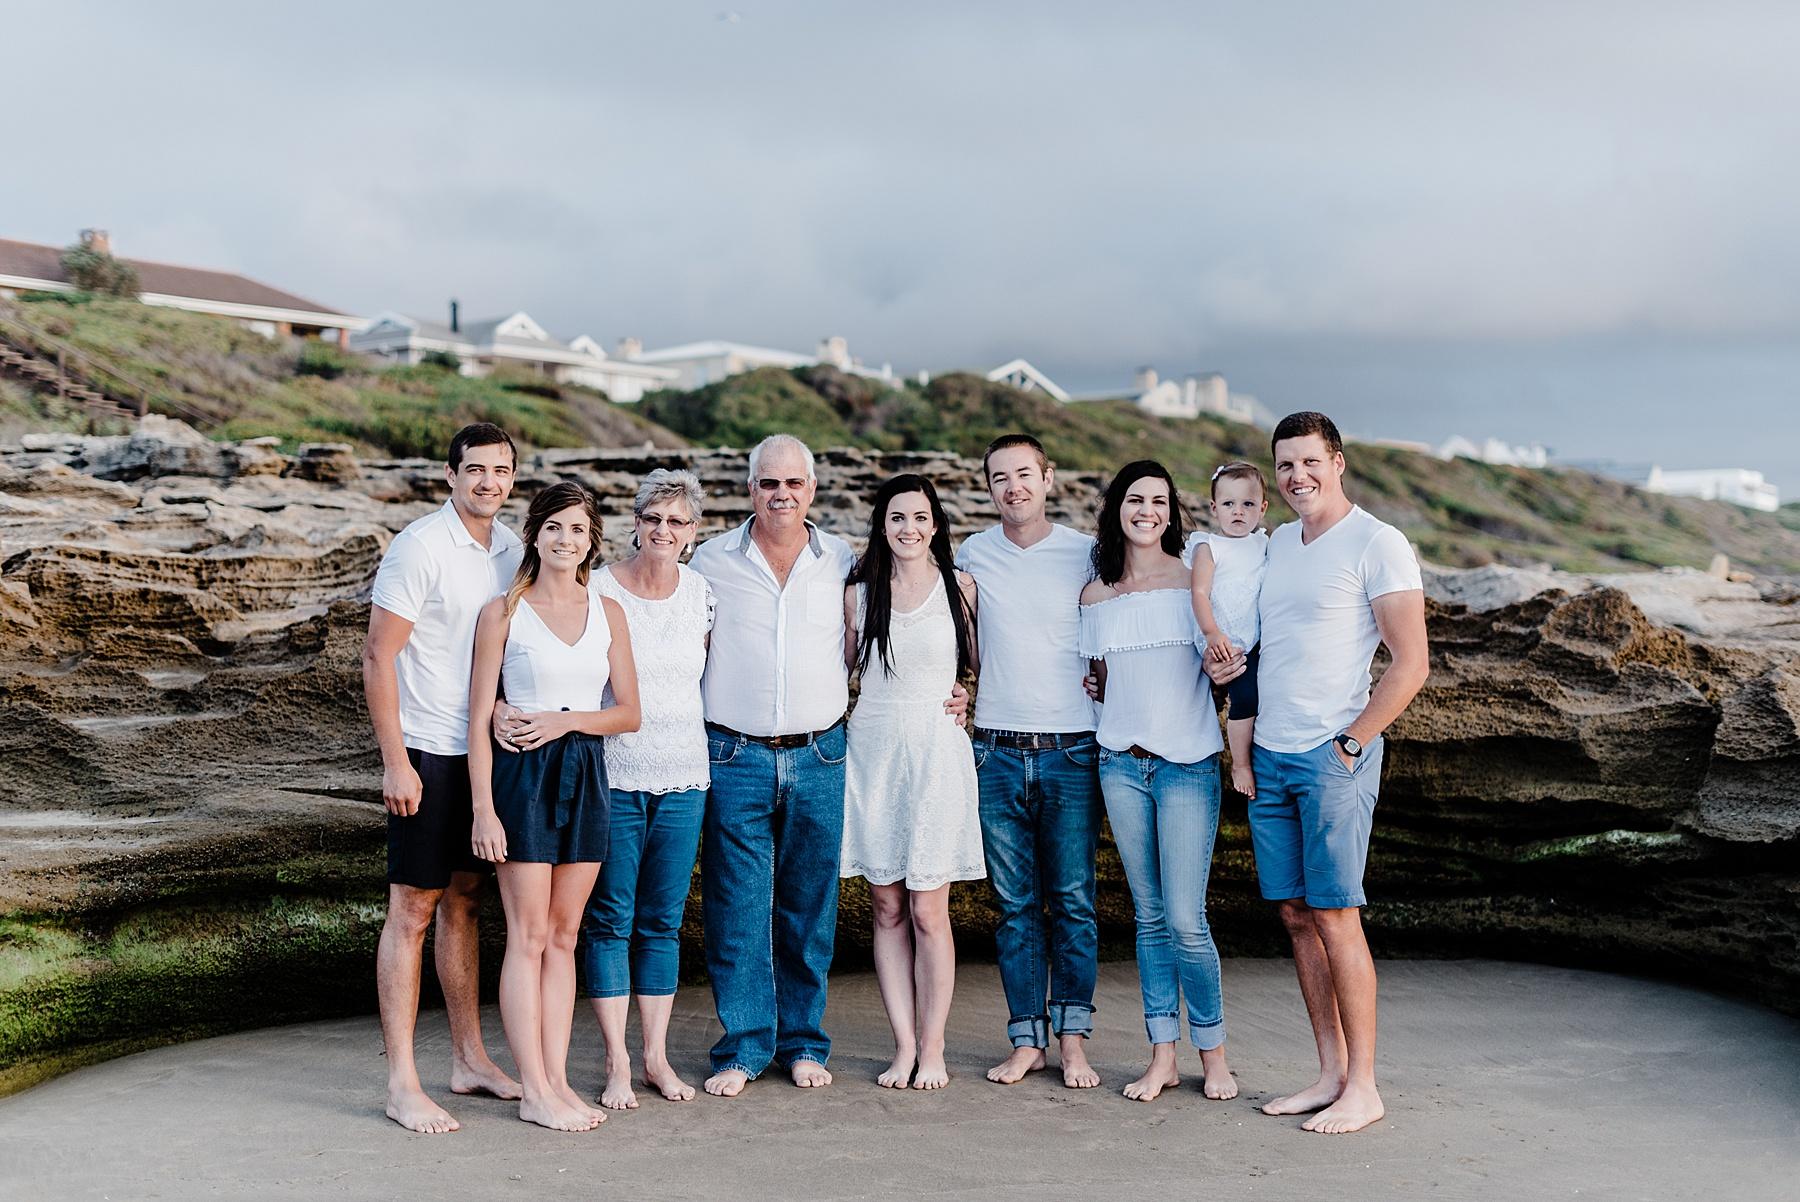 Moolman & Co Family